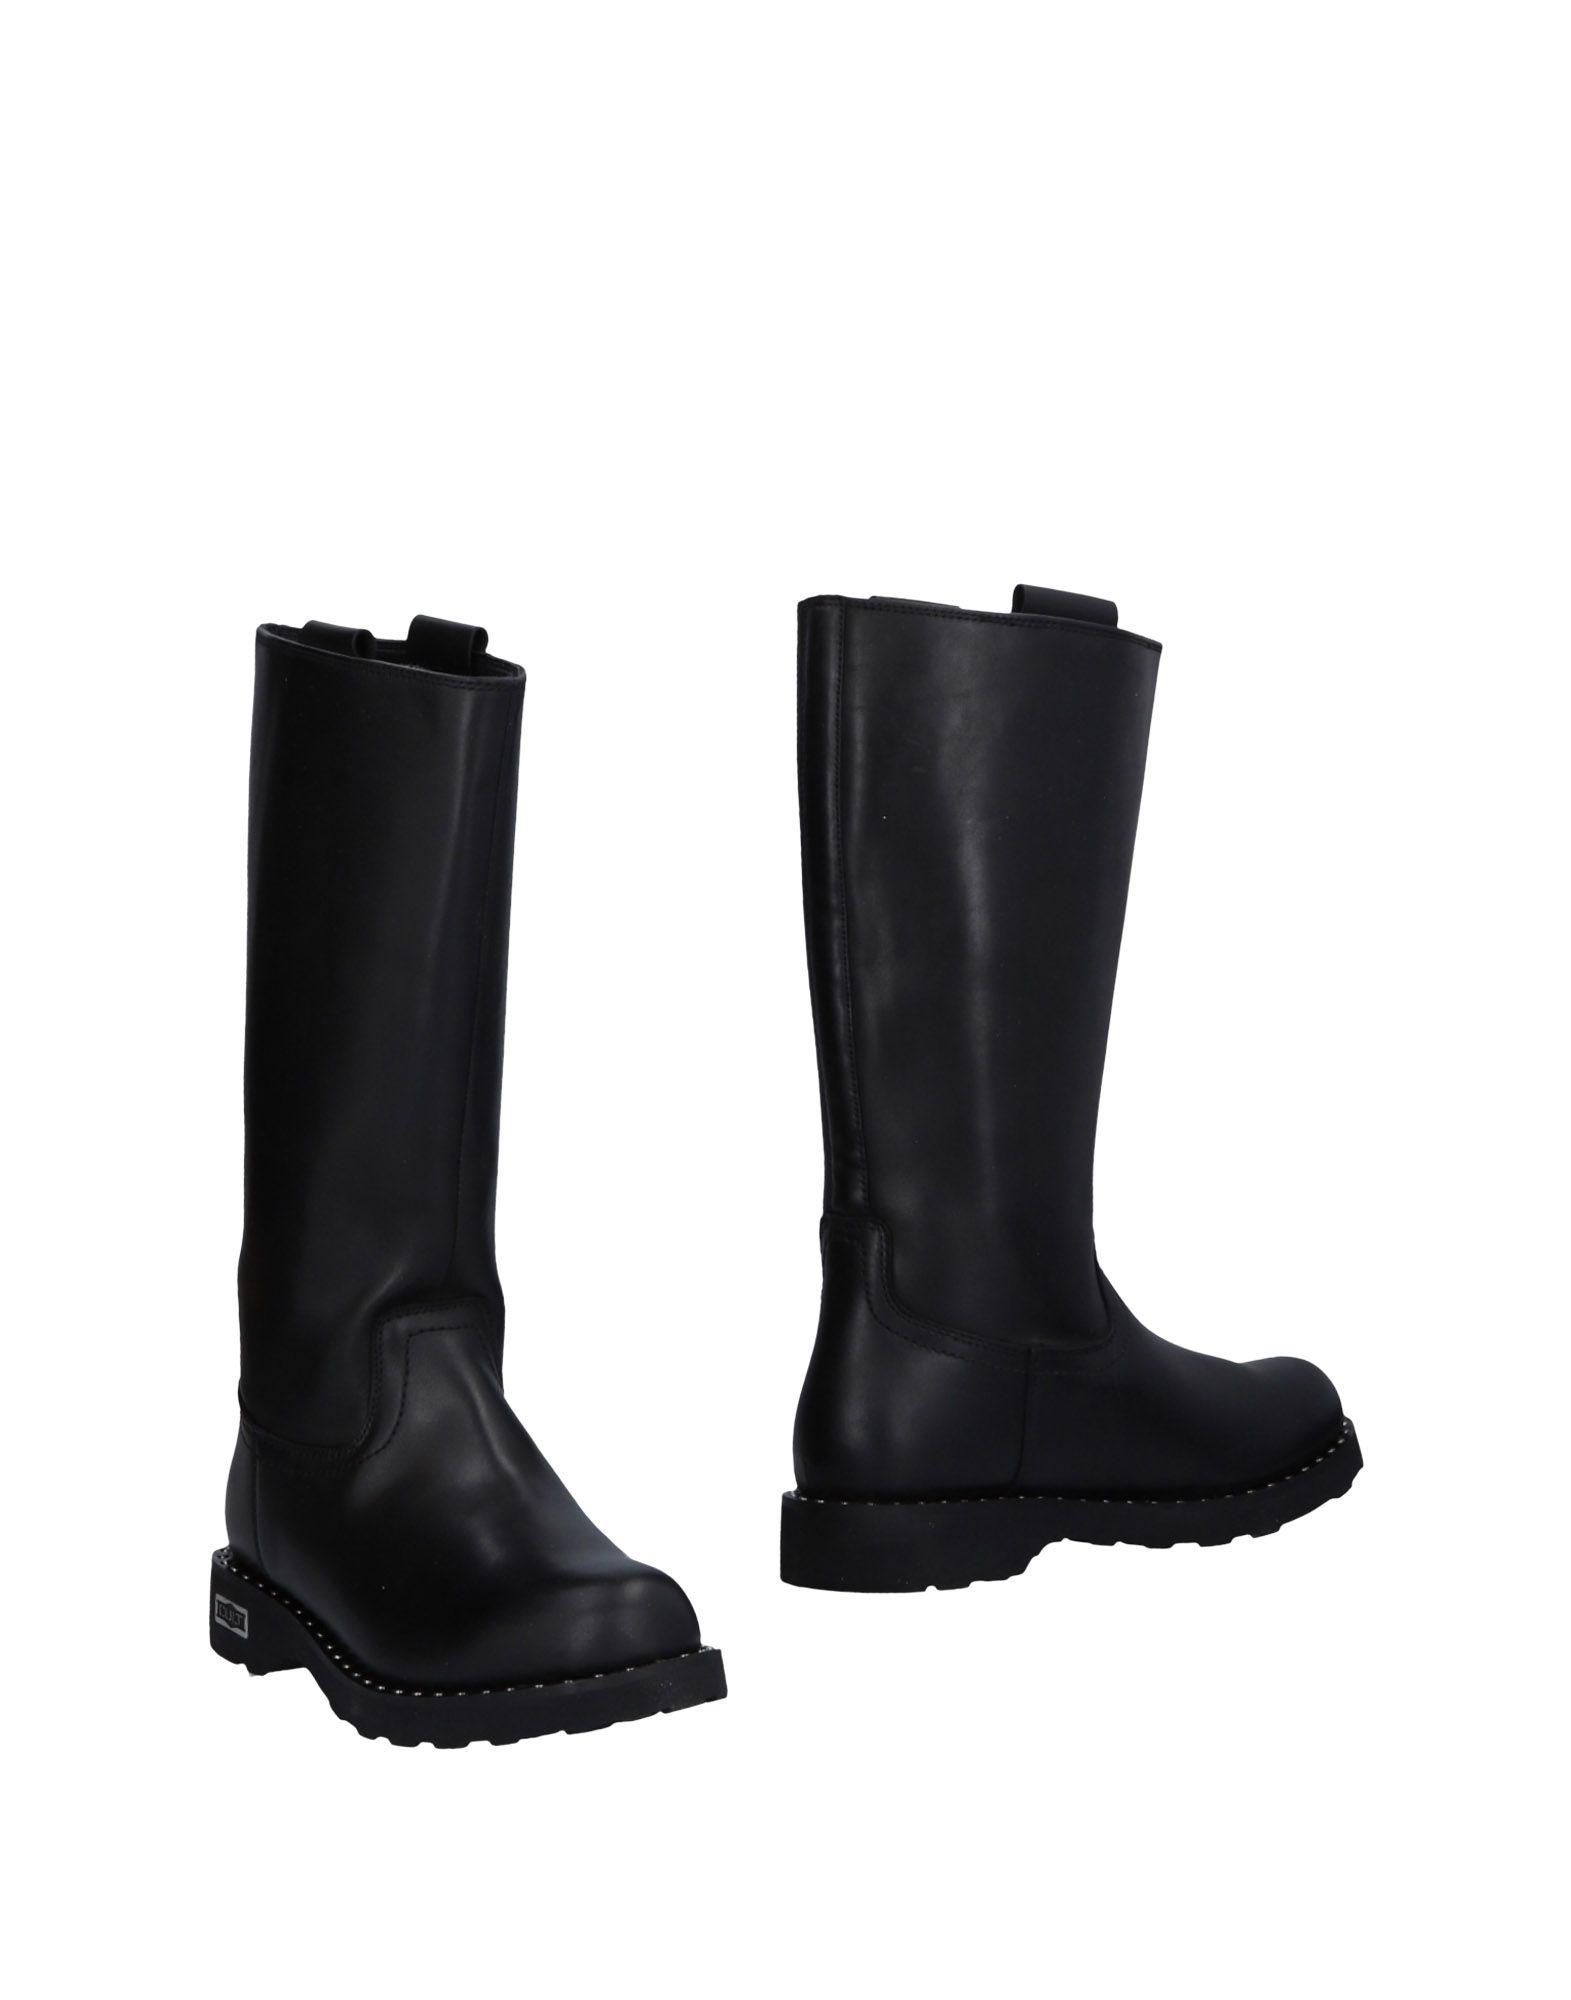 Cult Stiefel Damen  11473905AO Schuhe Heiße Schuhe 11473905AO 65b389